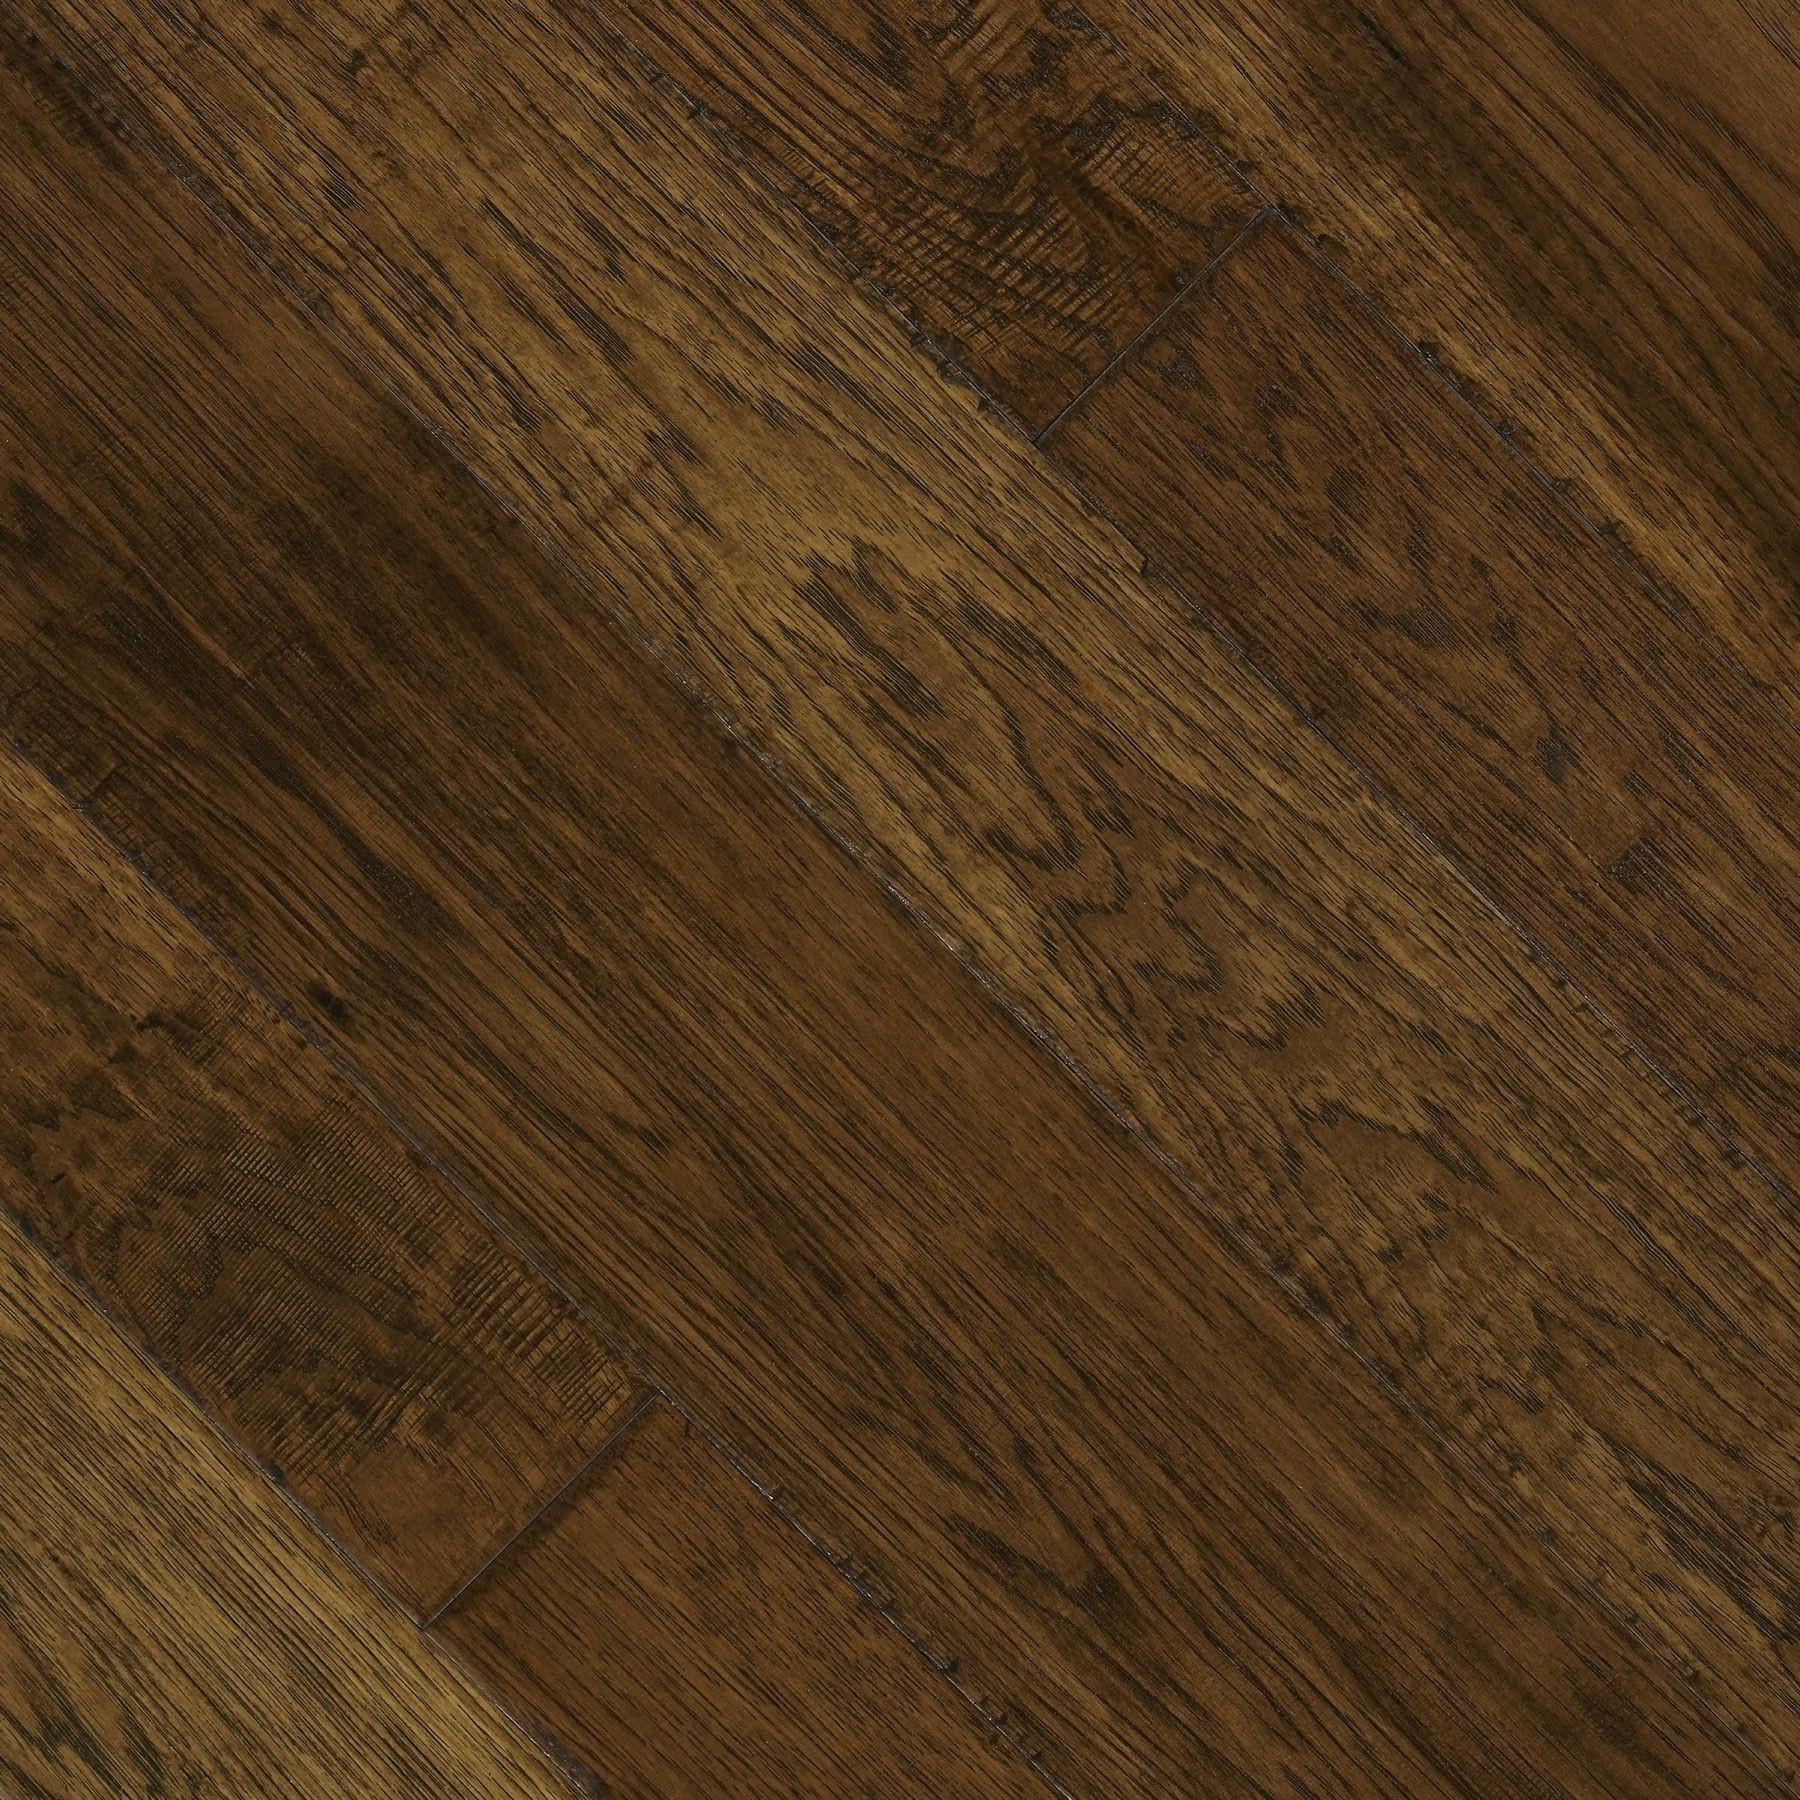 hardwood flooring kc of chalet hickory whistler pre finished wood floors pinterest woods for chalet hickory whistler